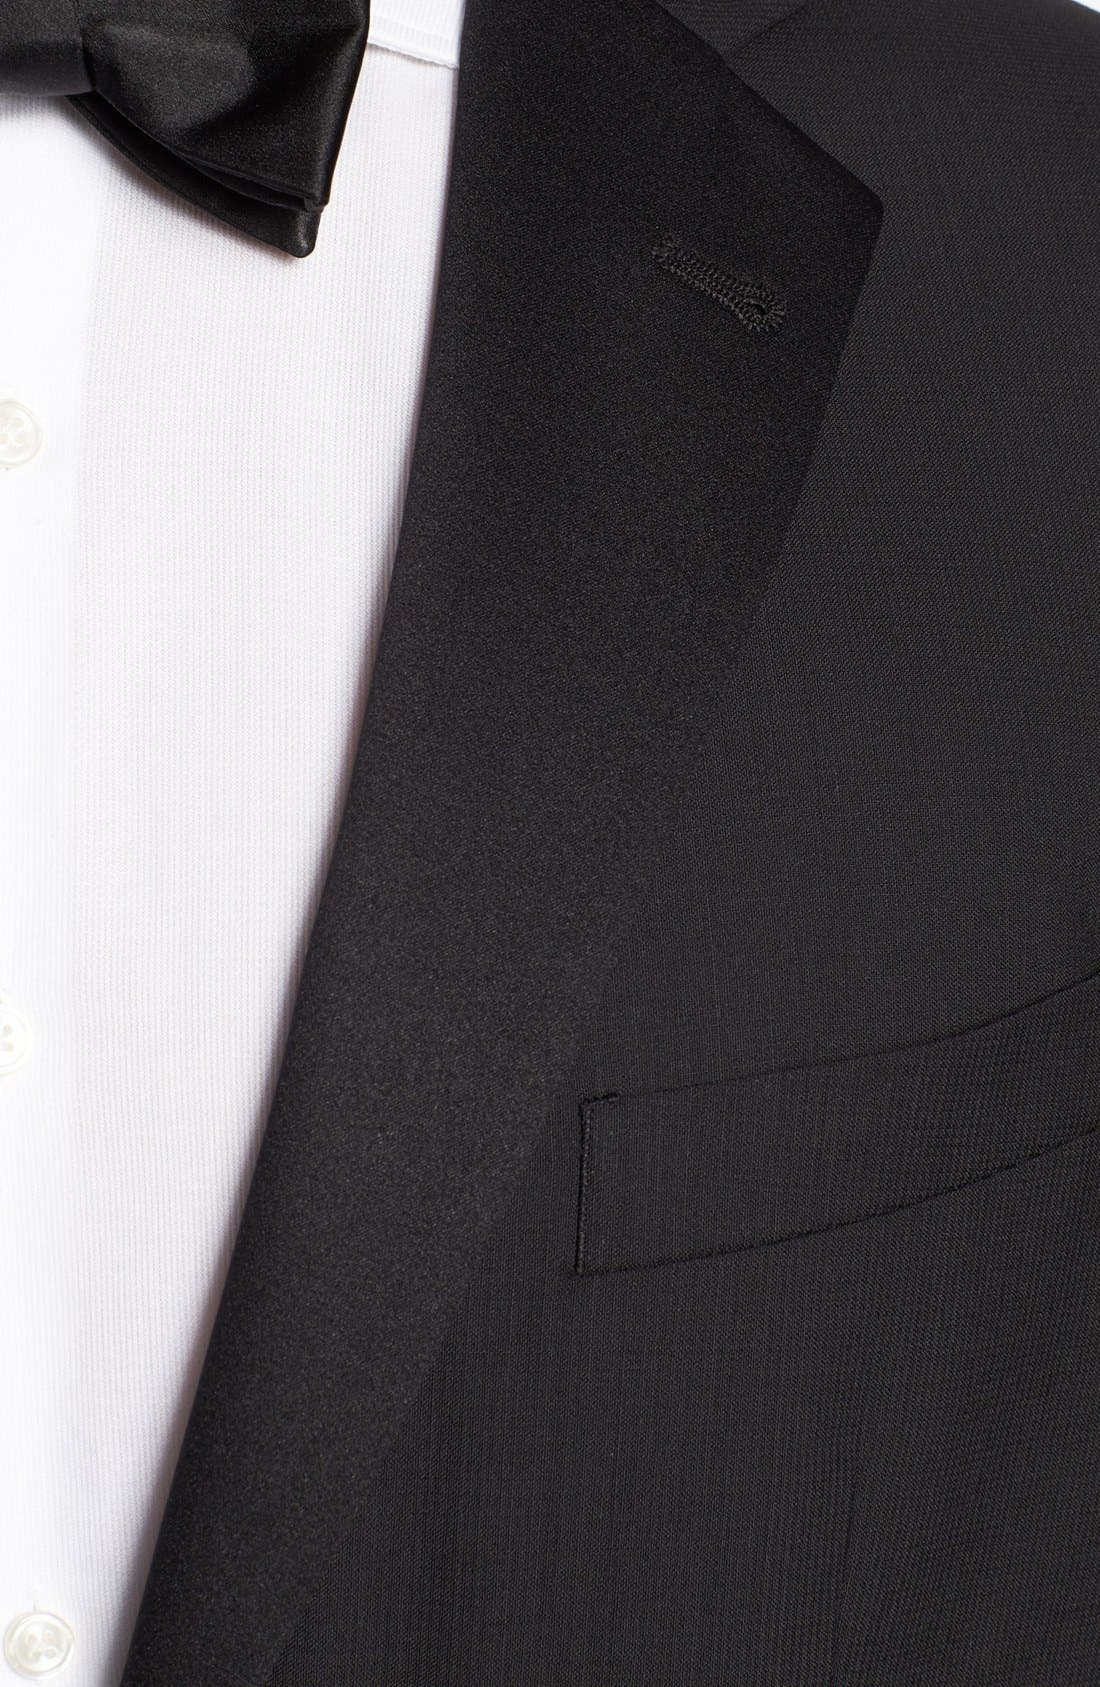 Alternate Image 2  - Joseph Abboud 'Profile Hybrid' Trim Fit Wool Tuxedo (Online Only)